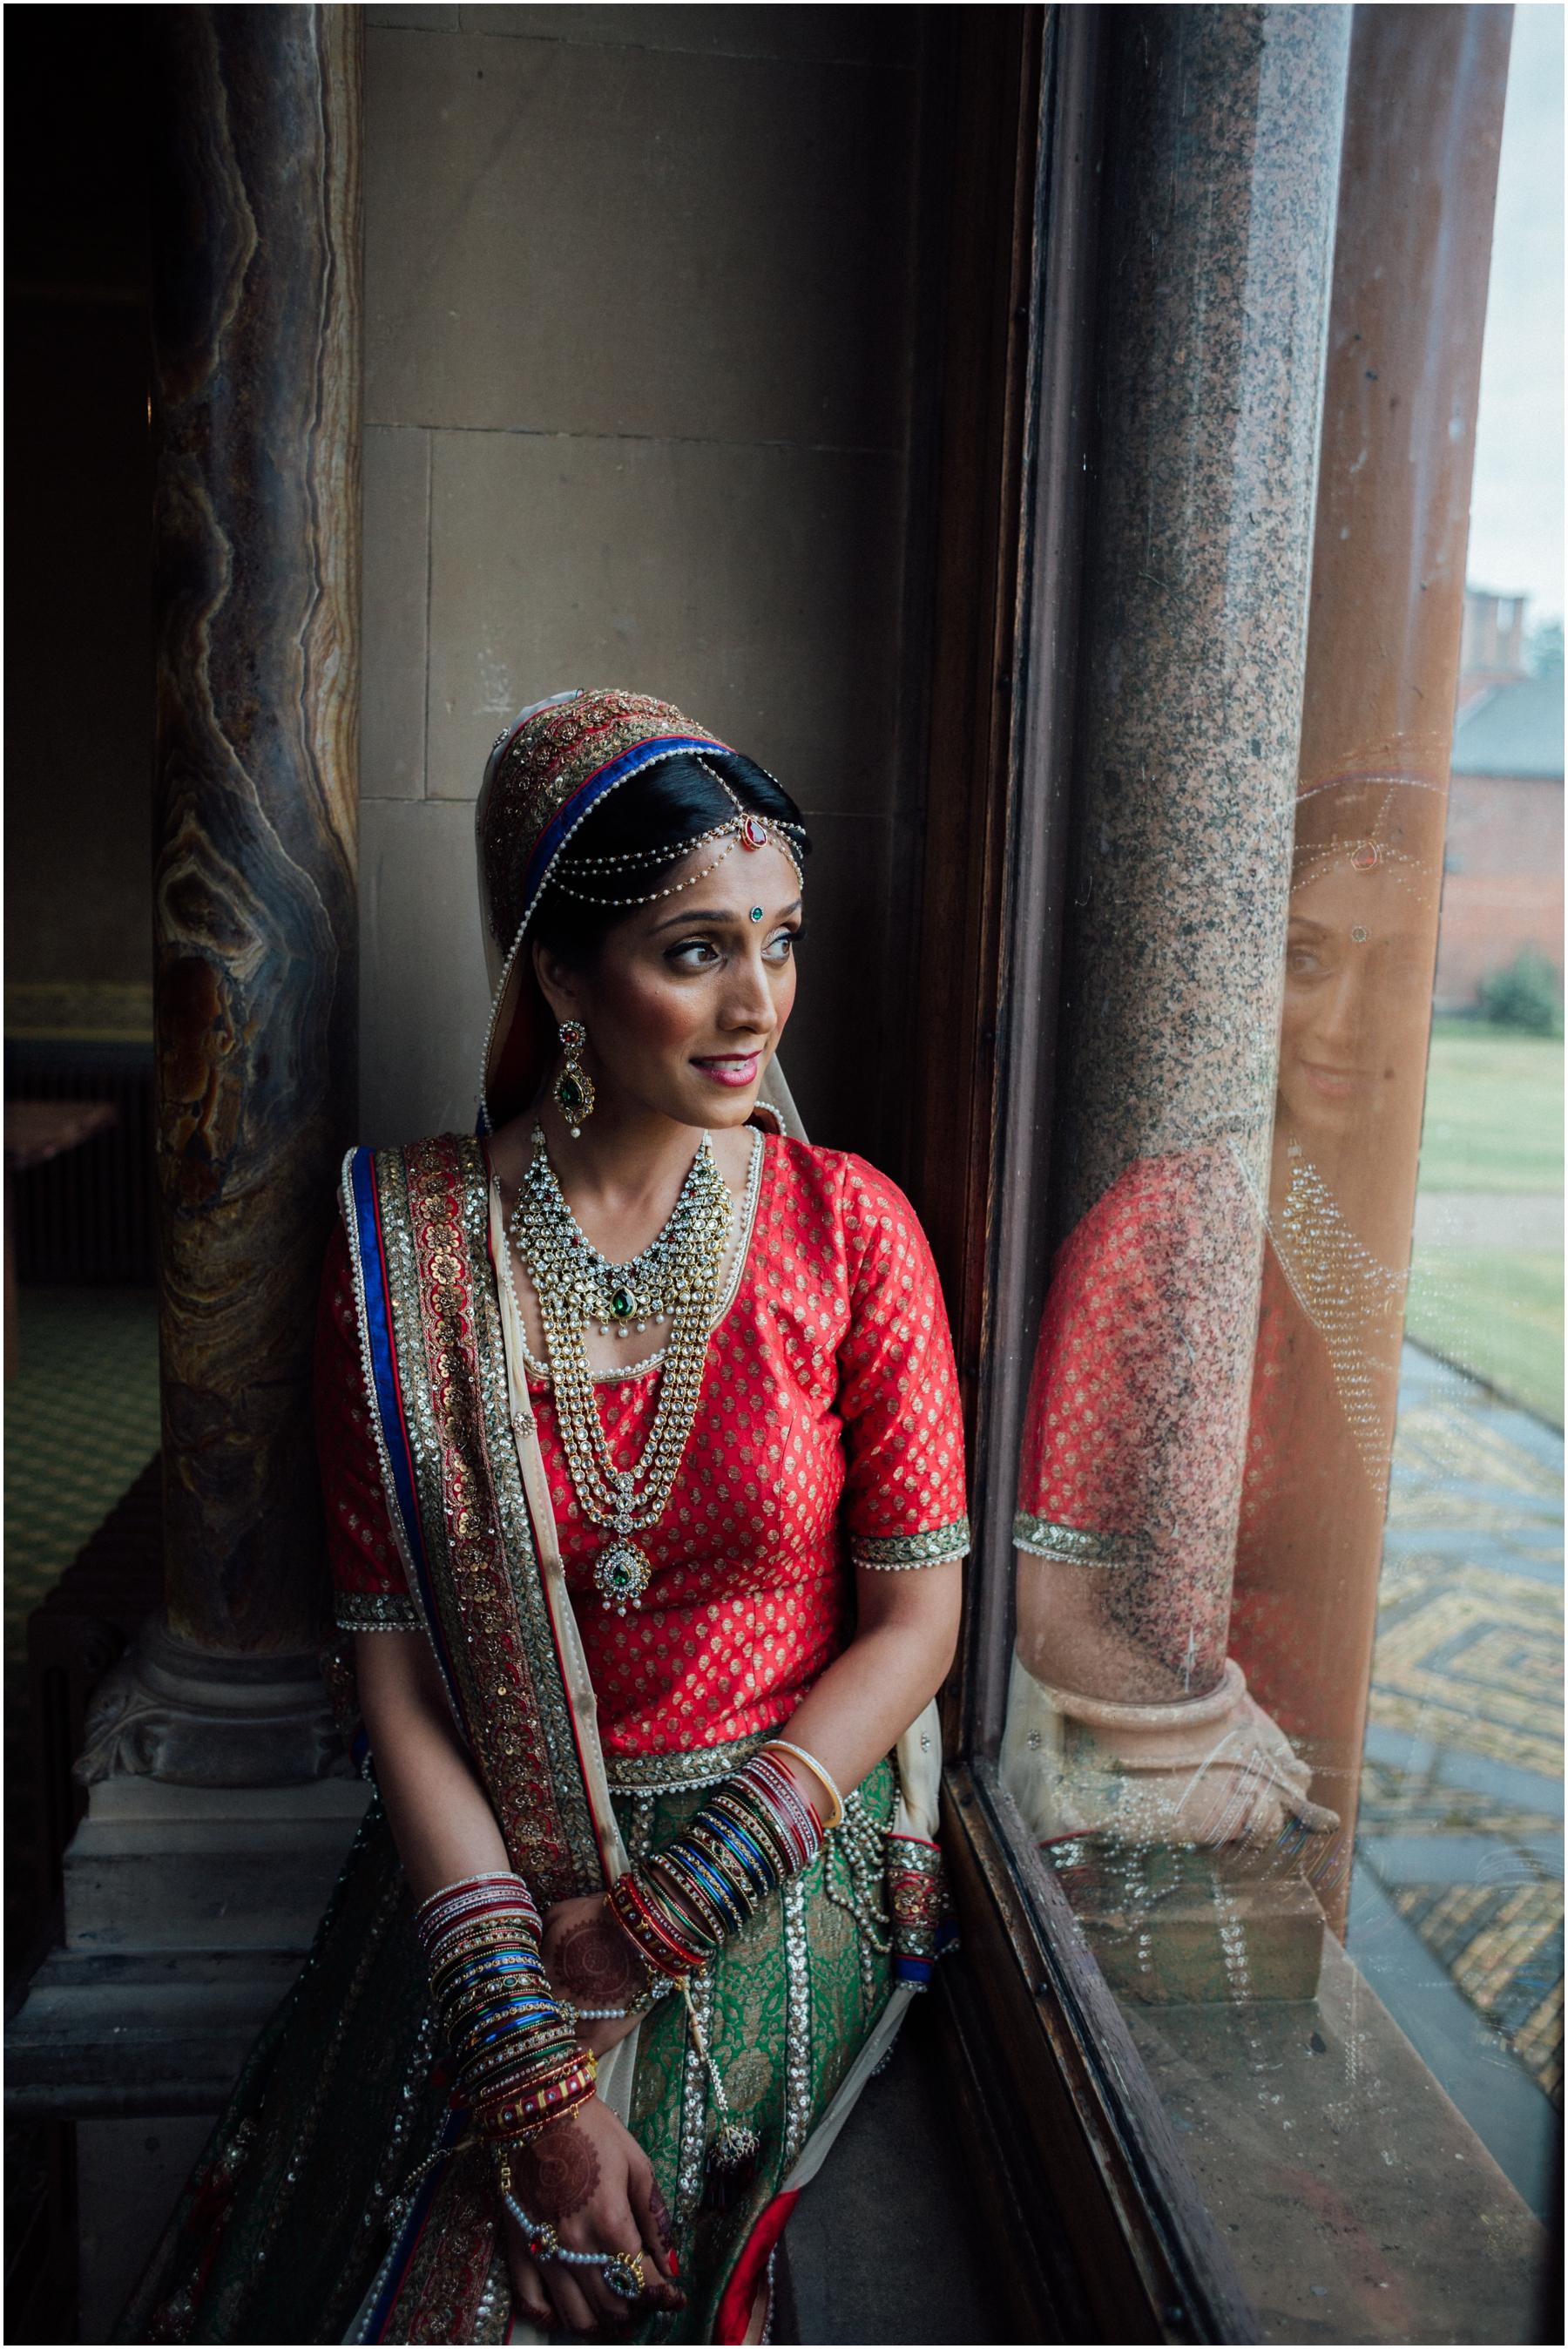 Indian Wedding Photography.Creative Indian Wedding Photography Kelham Hall Nottinghamshire